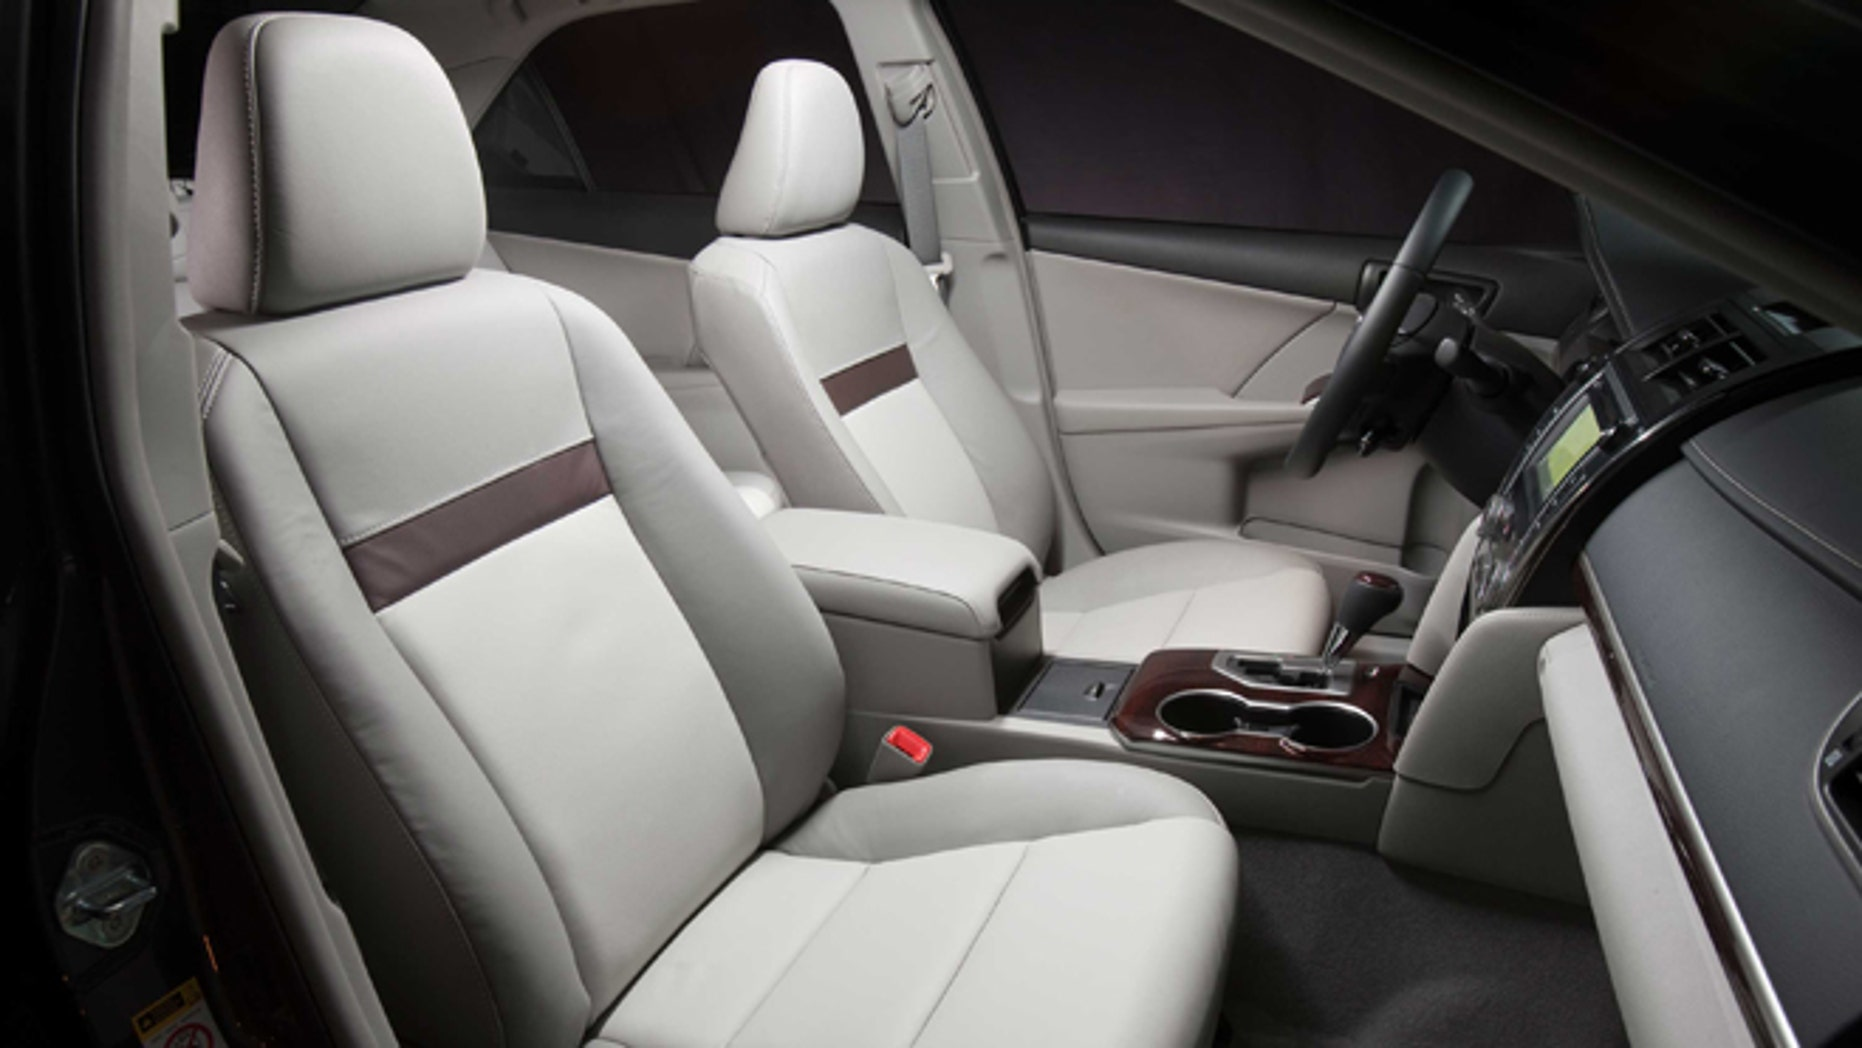 Toyota Camry XLE interior